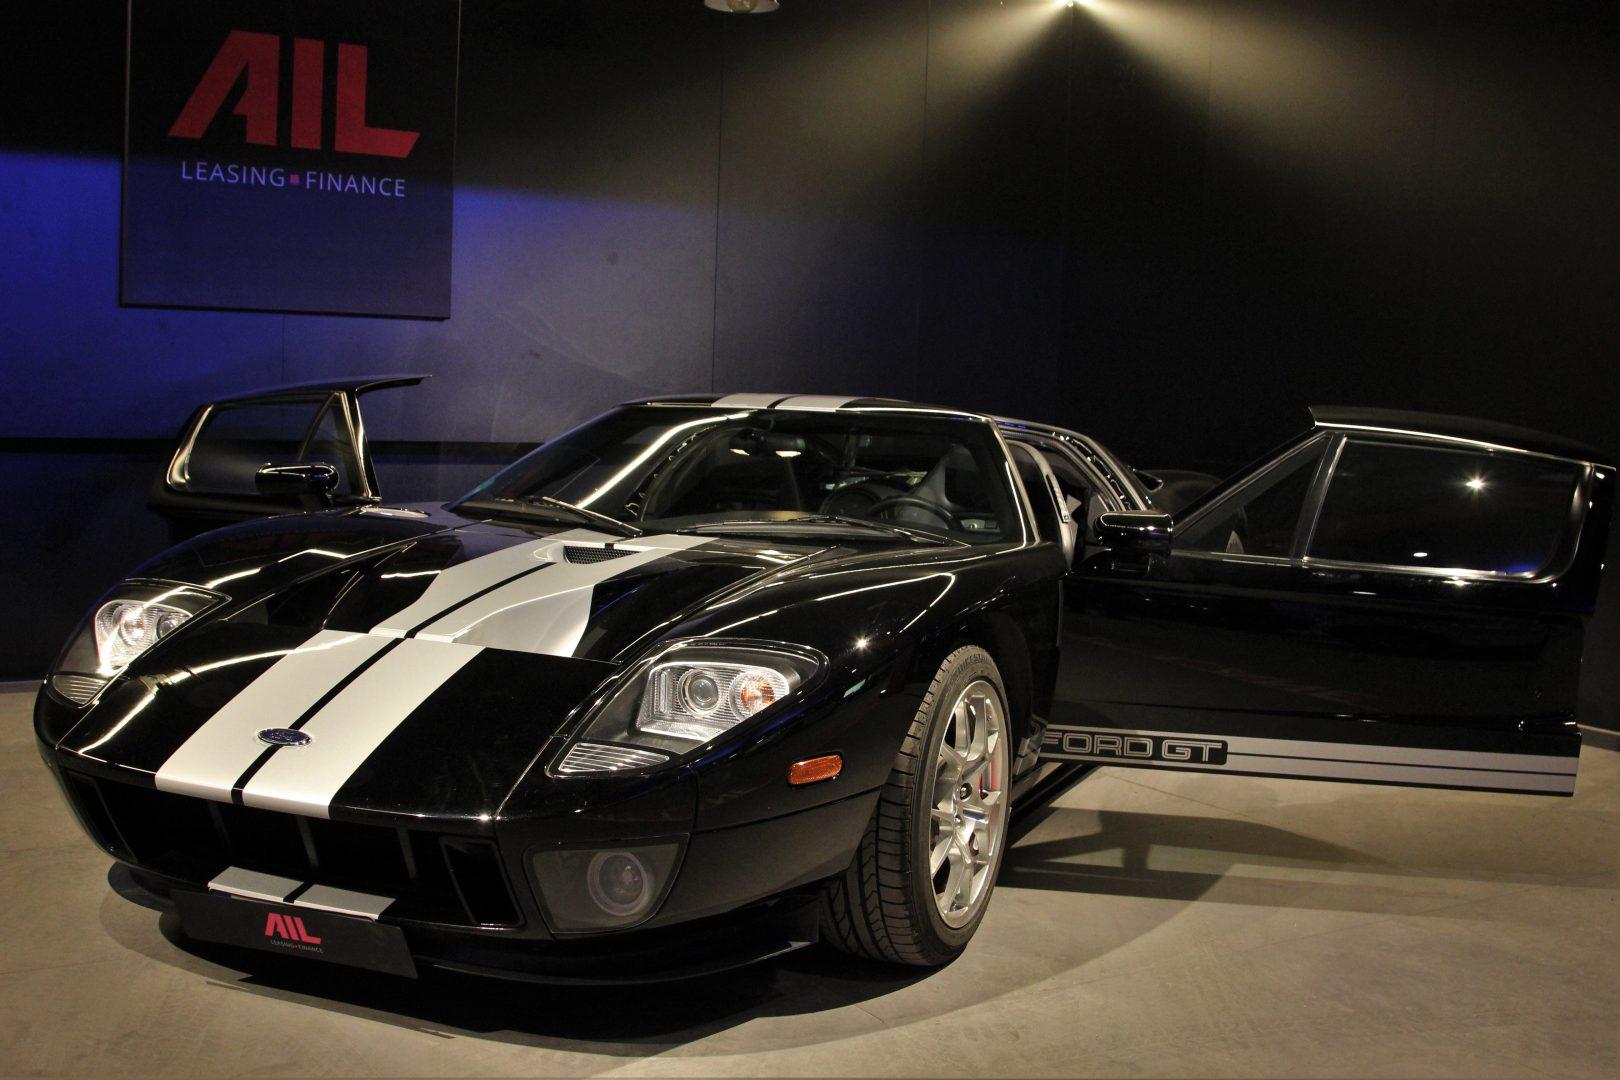 AIL Ford GT 5.4L V8 Supercharger 5